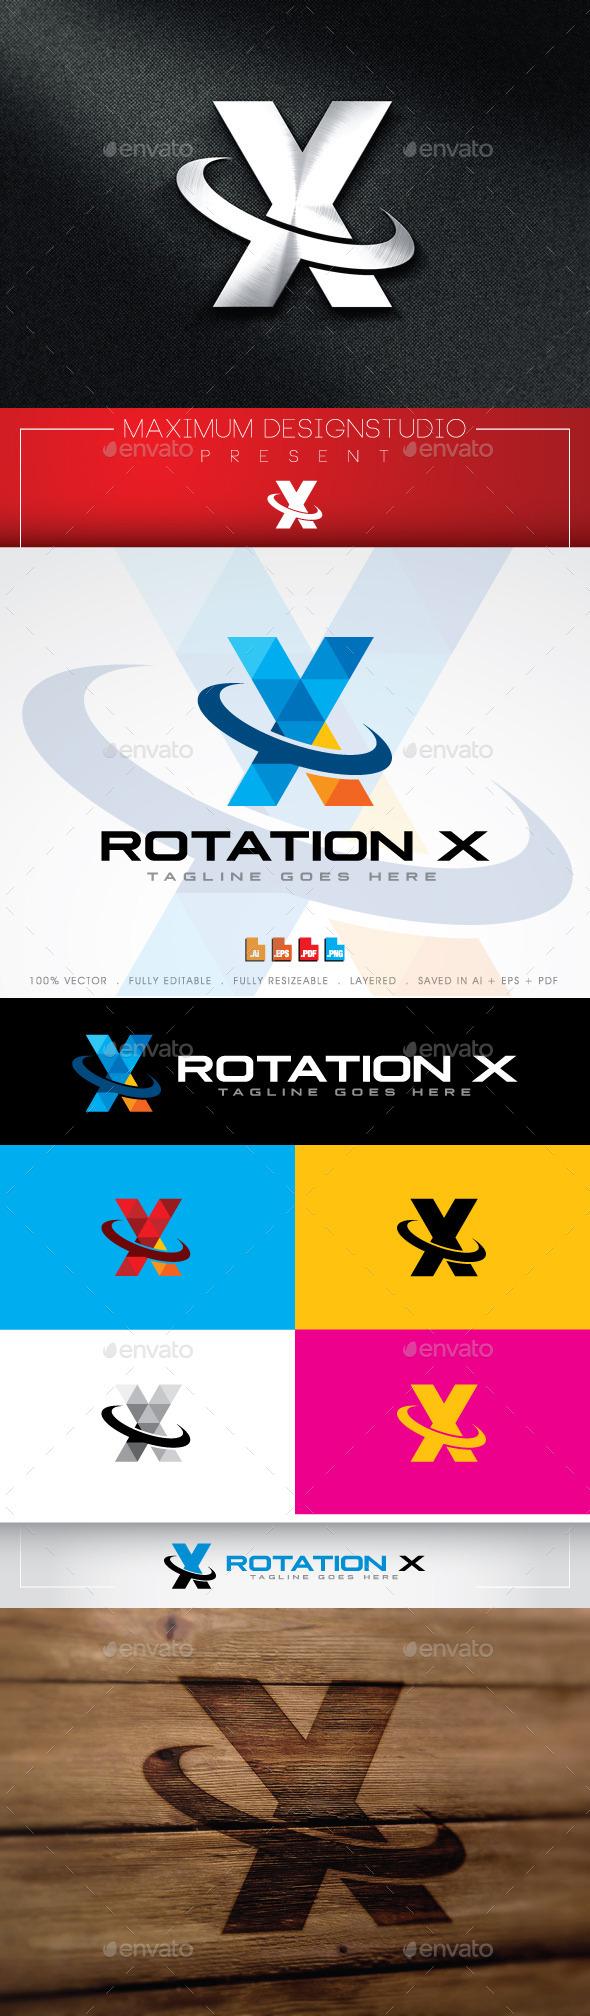 Rotation X Logo